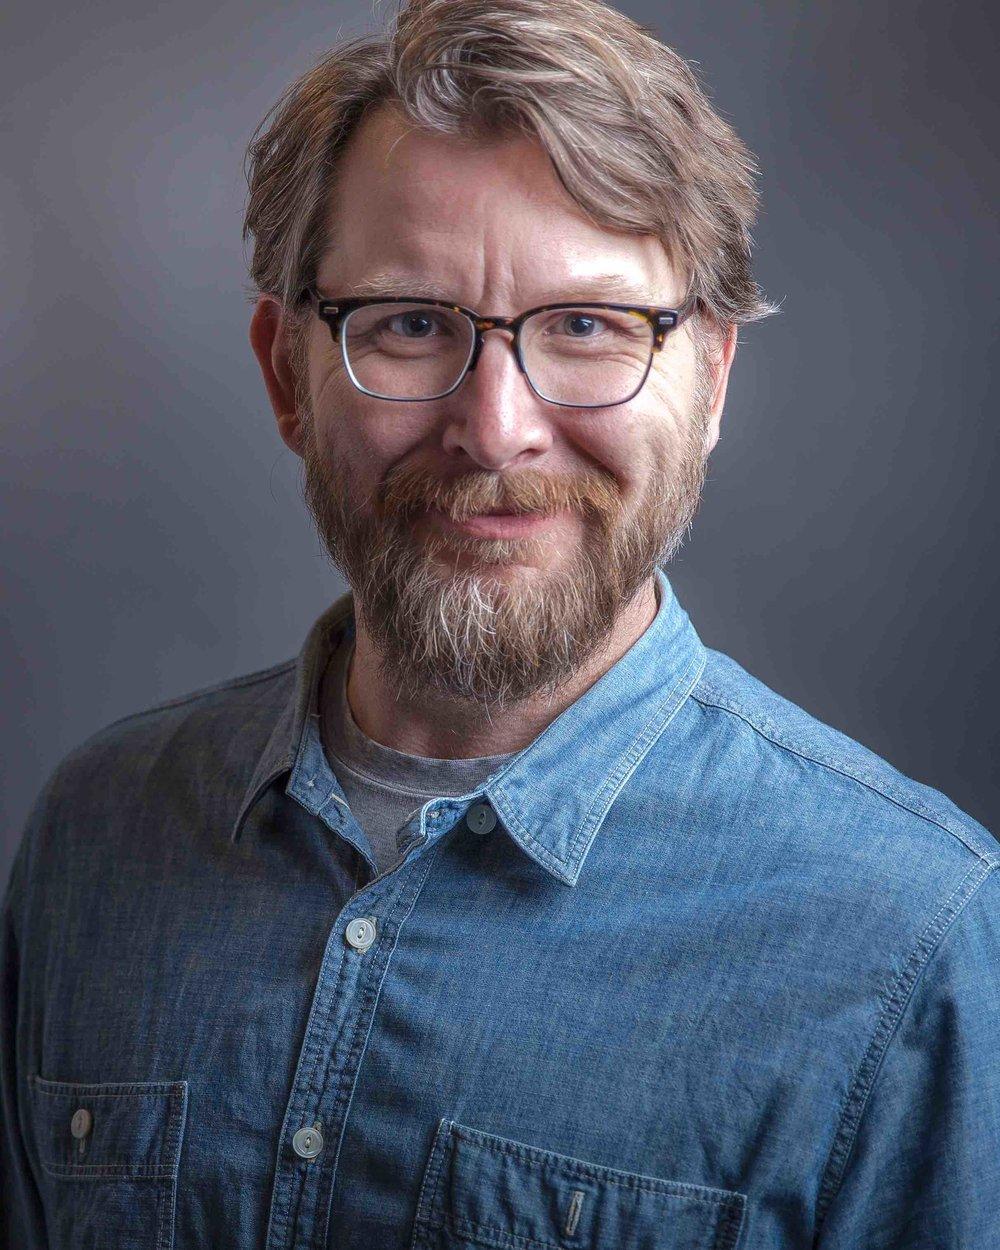 Tim Weldon, Boston Creative Director